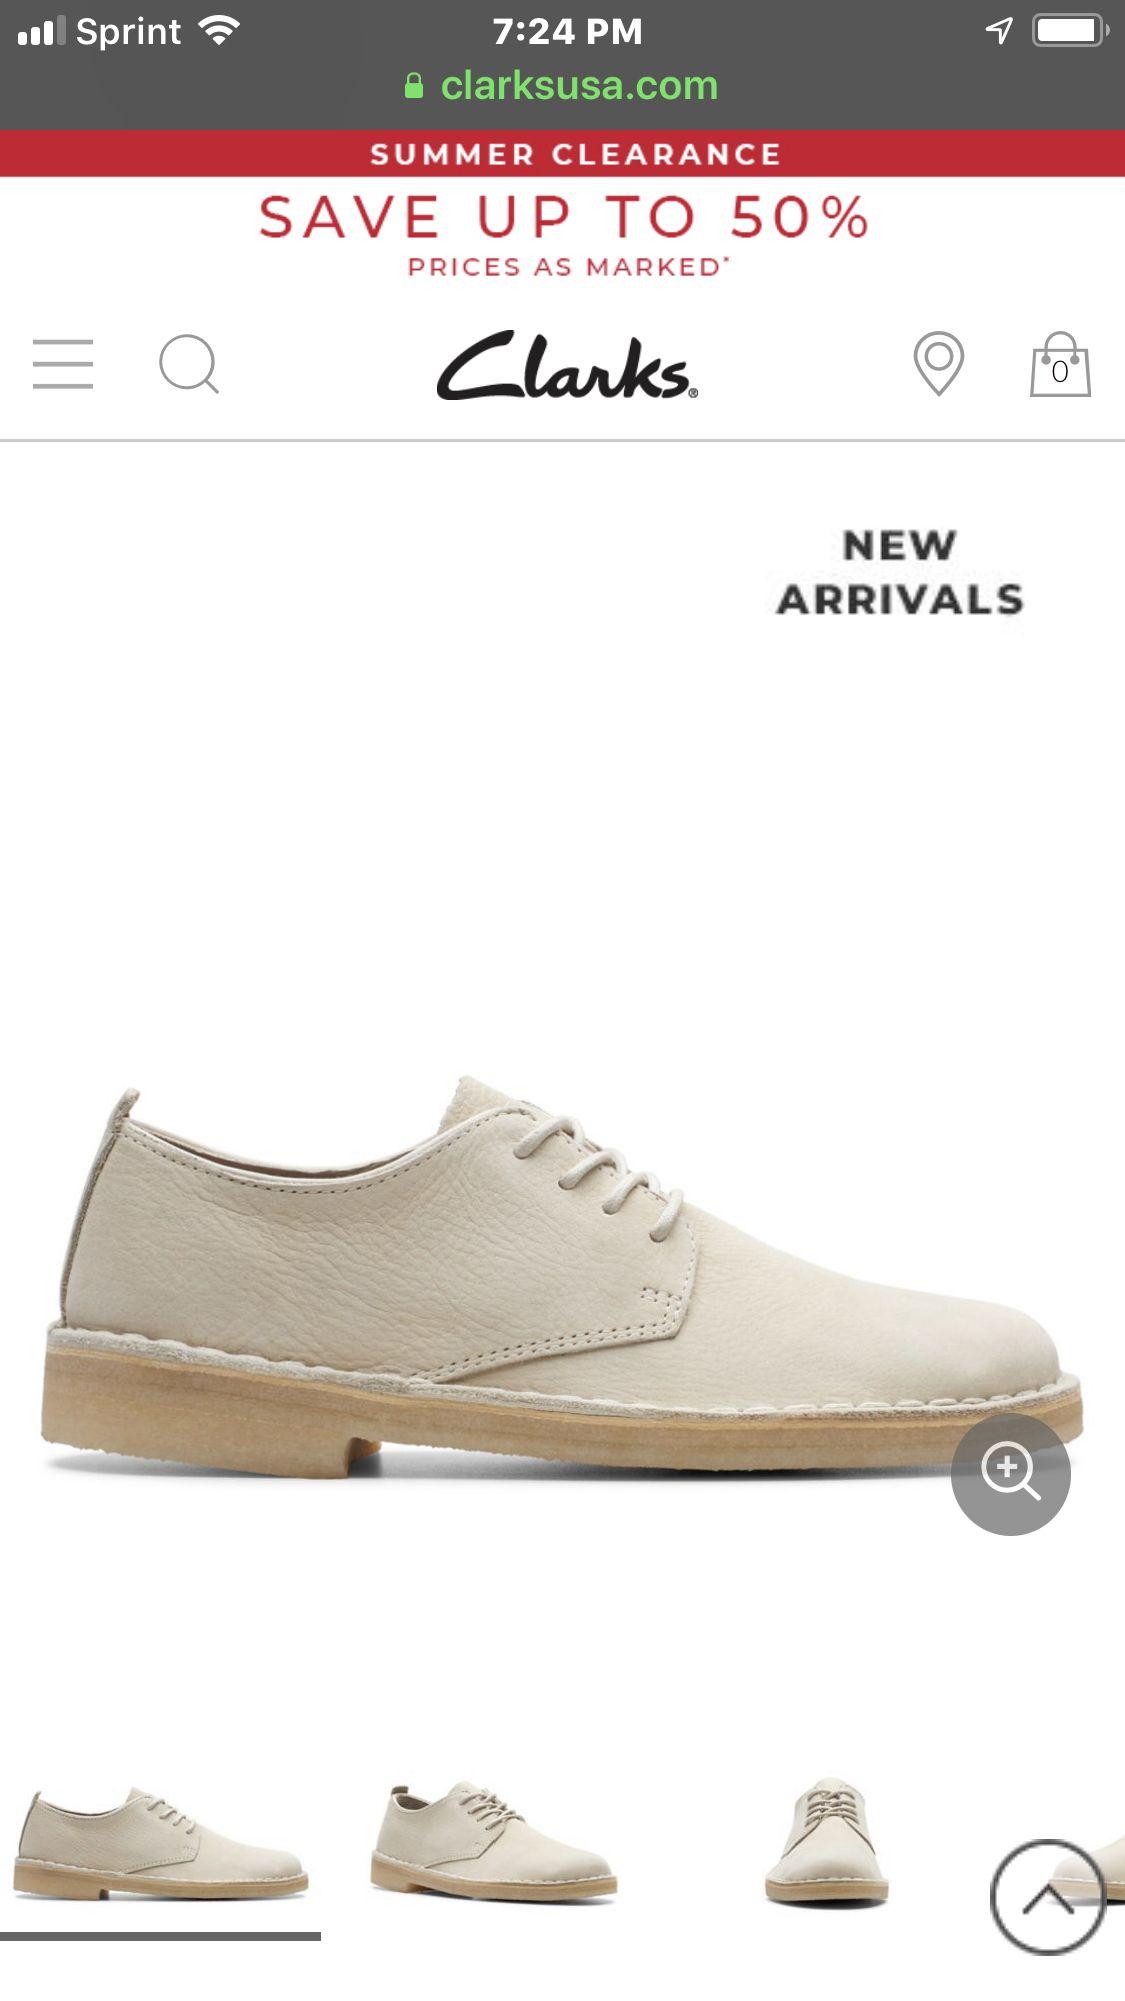 Asimilar cámara En riesgo  Pin by MOORES on Shoes & Bags | Summer clearance, Shoes, Golden goose  sneaker